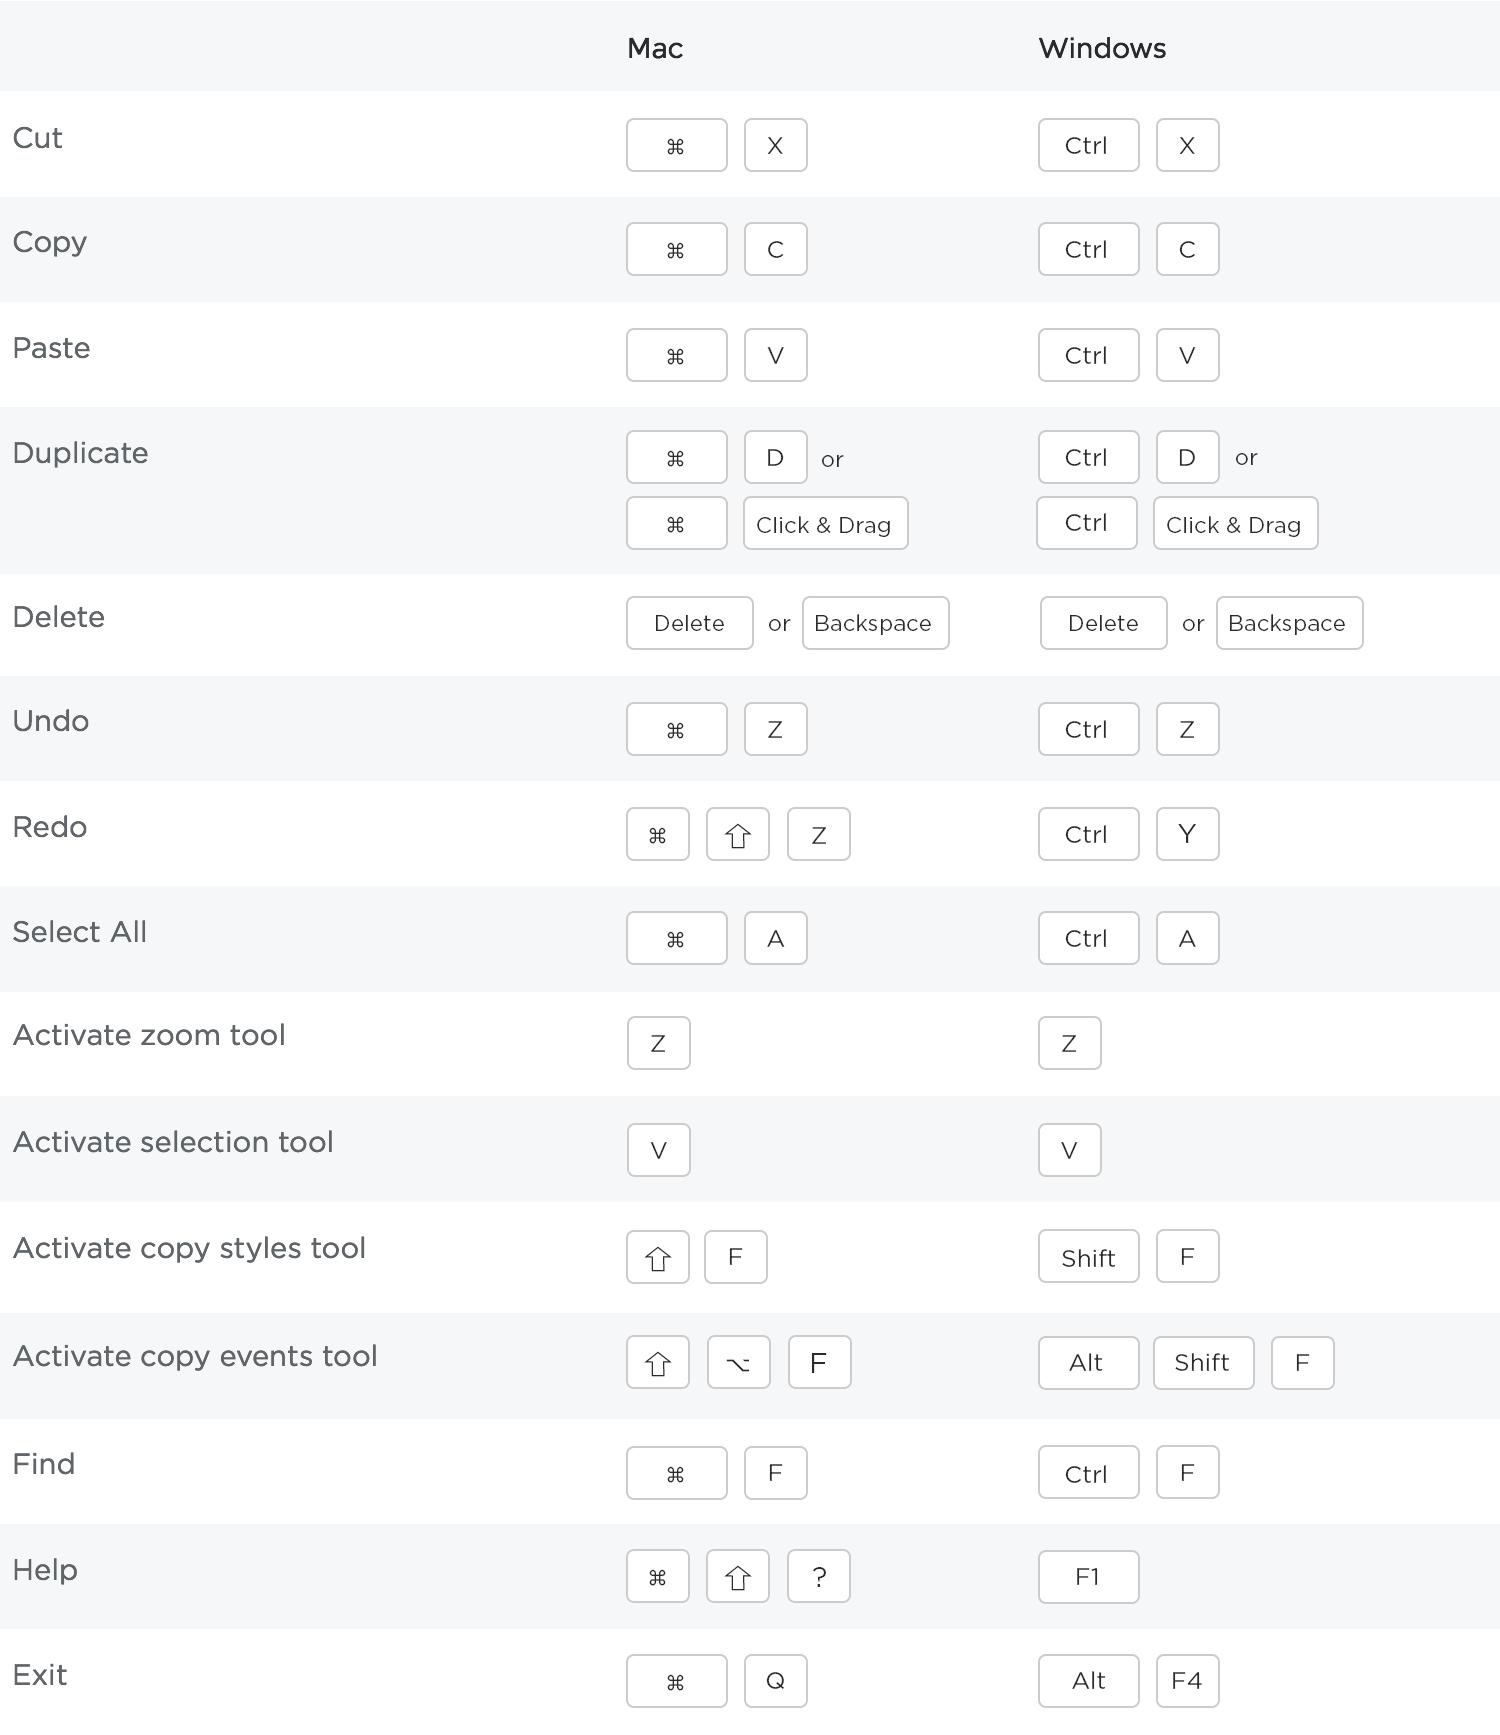 Standard shortcuts